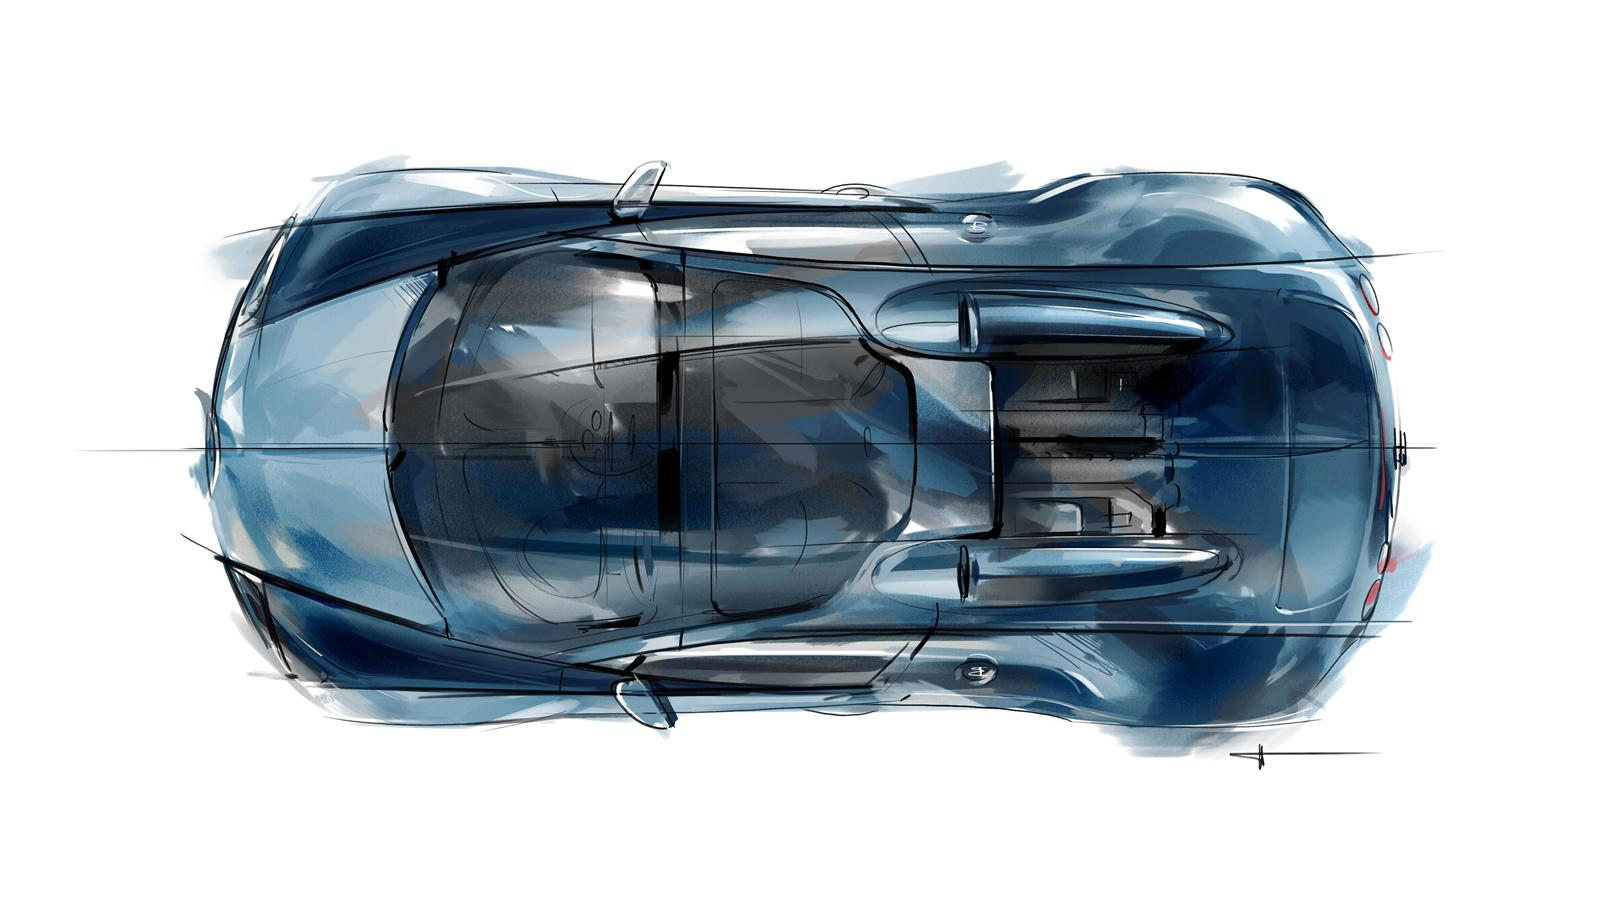 bugatti veyron grand sport vitesse legend jean pierre wimille edition. Black Bedroom Furniture Sets. Home Design Ideas